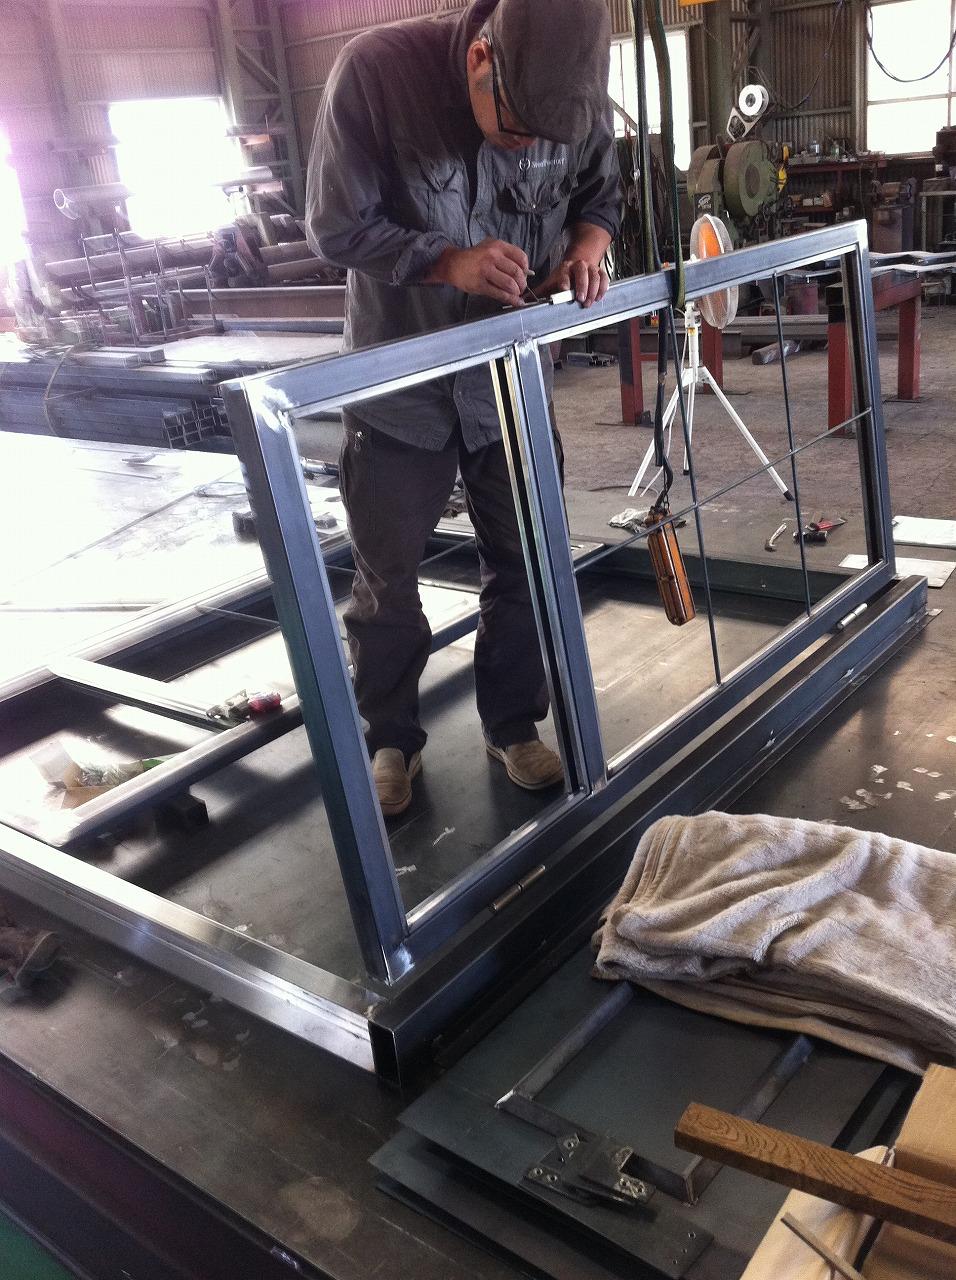 http://www.steel-factory.jp/blog/udata/20130630-120648.jpg